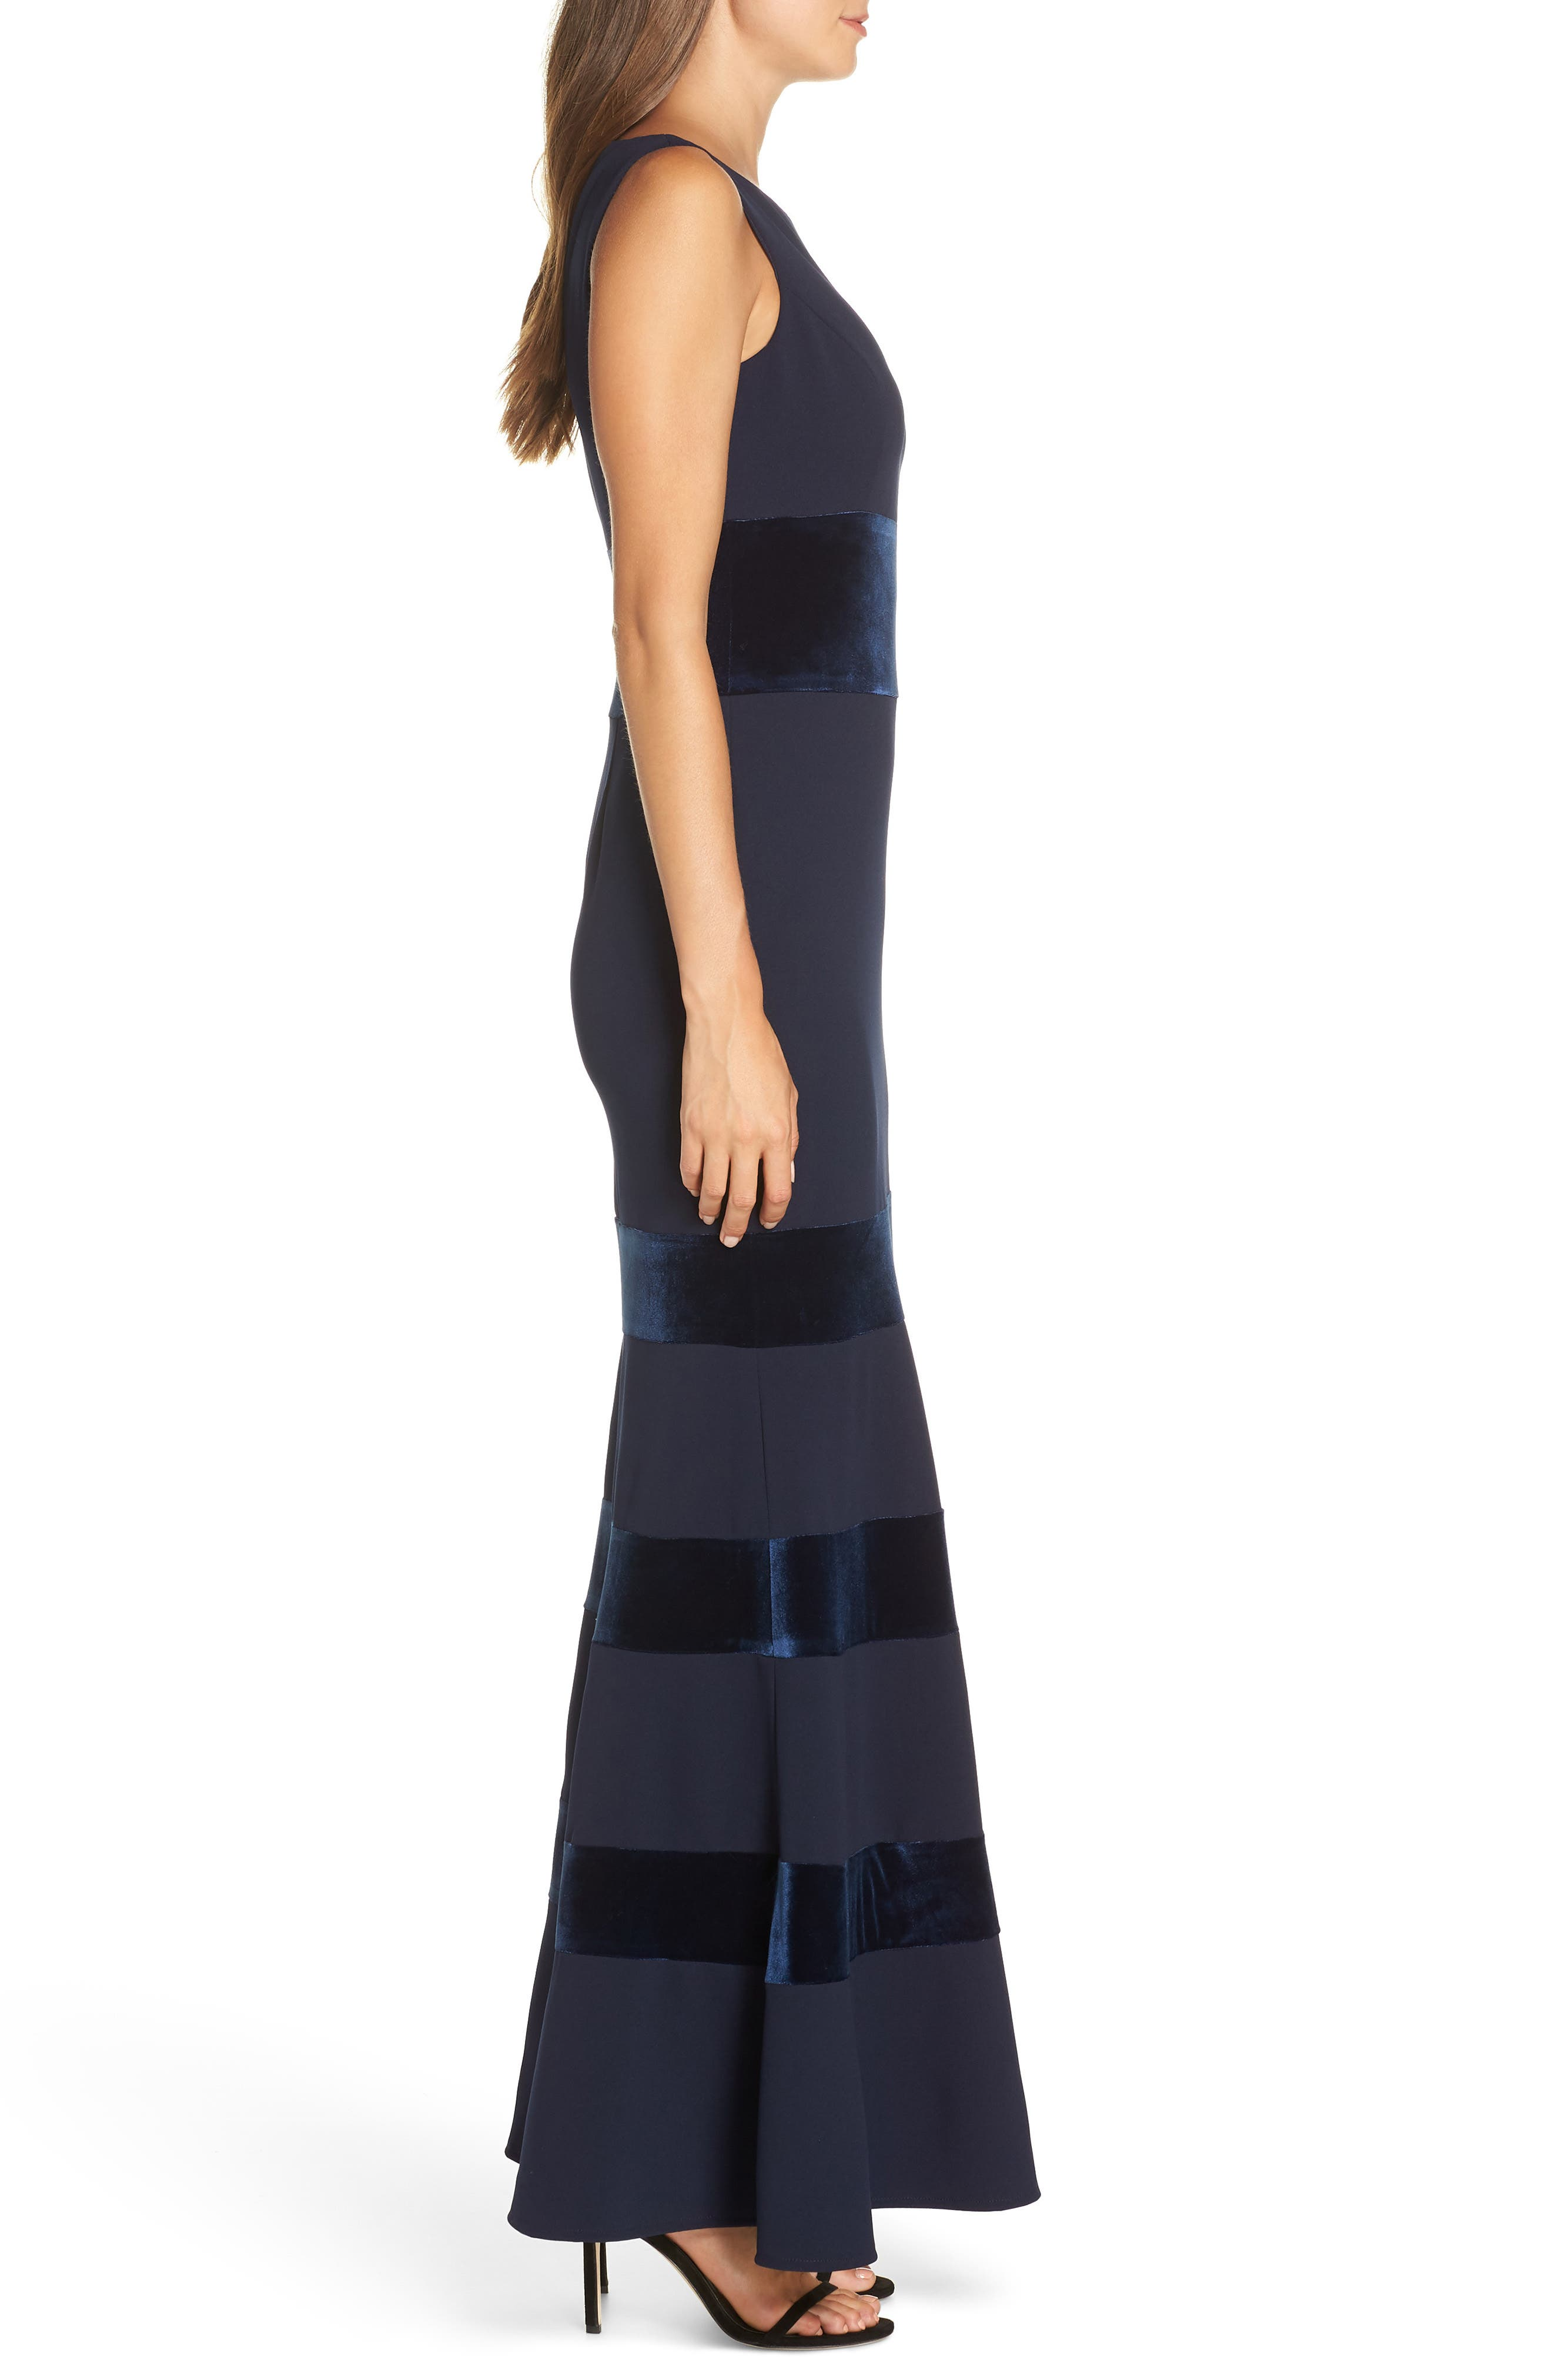 VINCE CAMUTO, Velvet & Scuba Crepe Mermaid Gown, Alternate thumbnail 4, color, NAVY